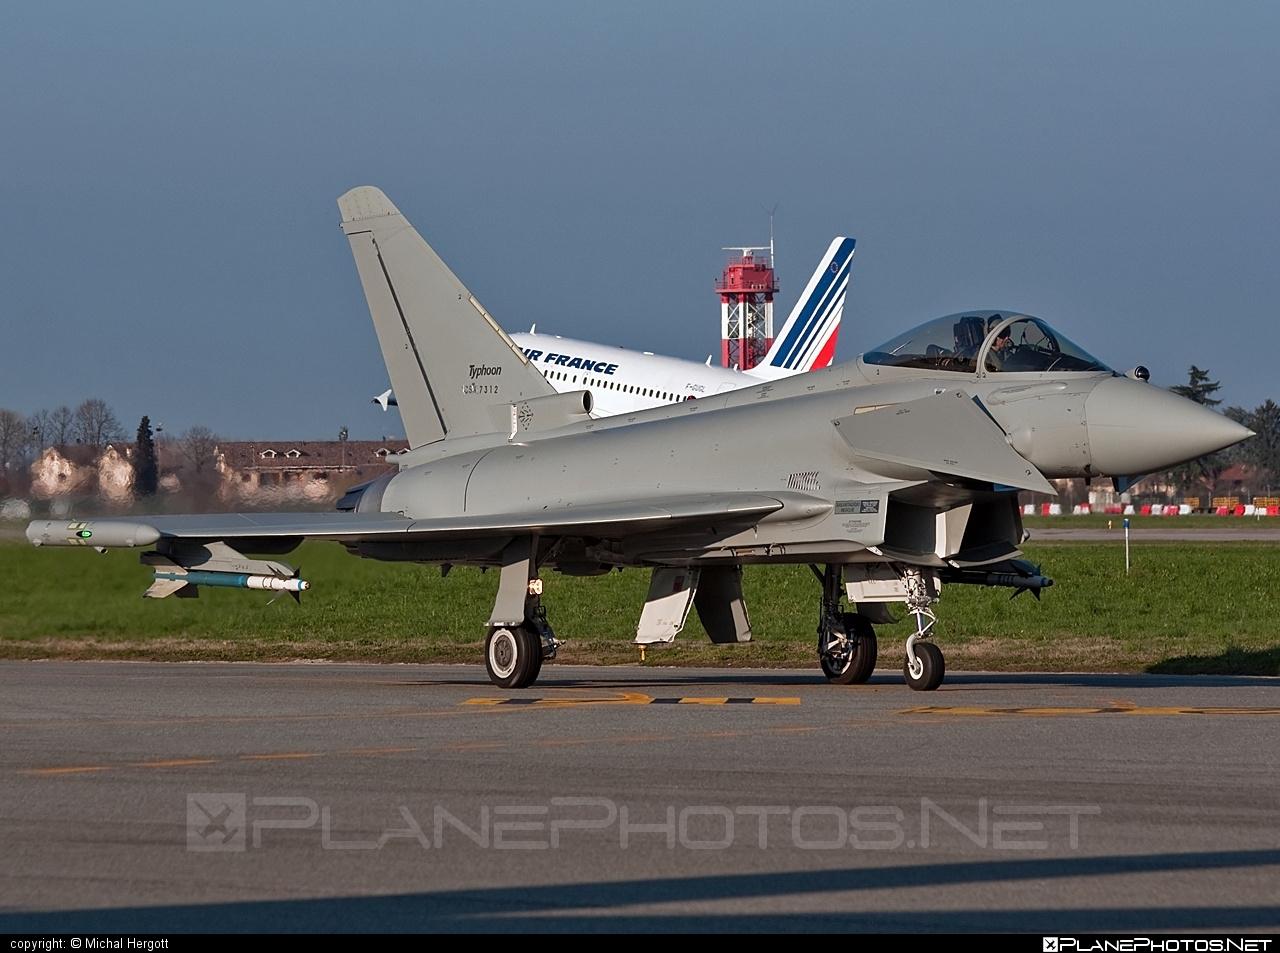 Eurofighter Typhoon S - CSX7312 operated by Aeronautica Militare (Italian Air Force) #eurofighter #typhoon